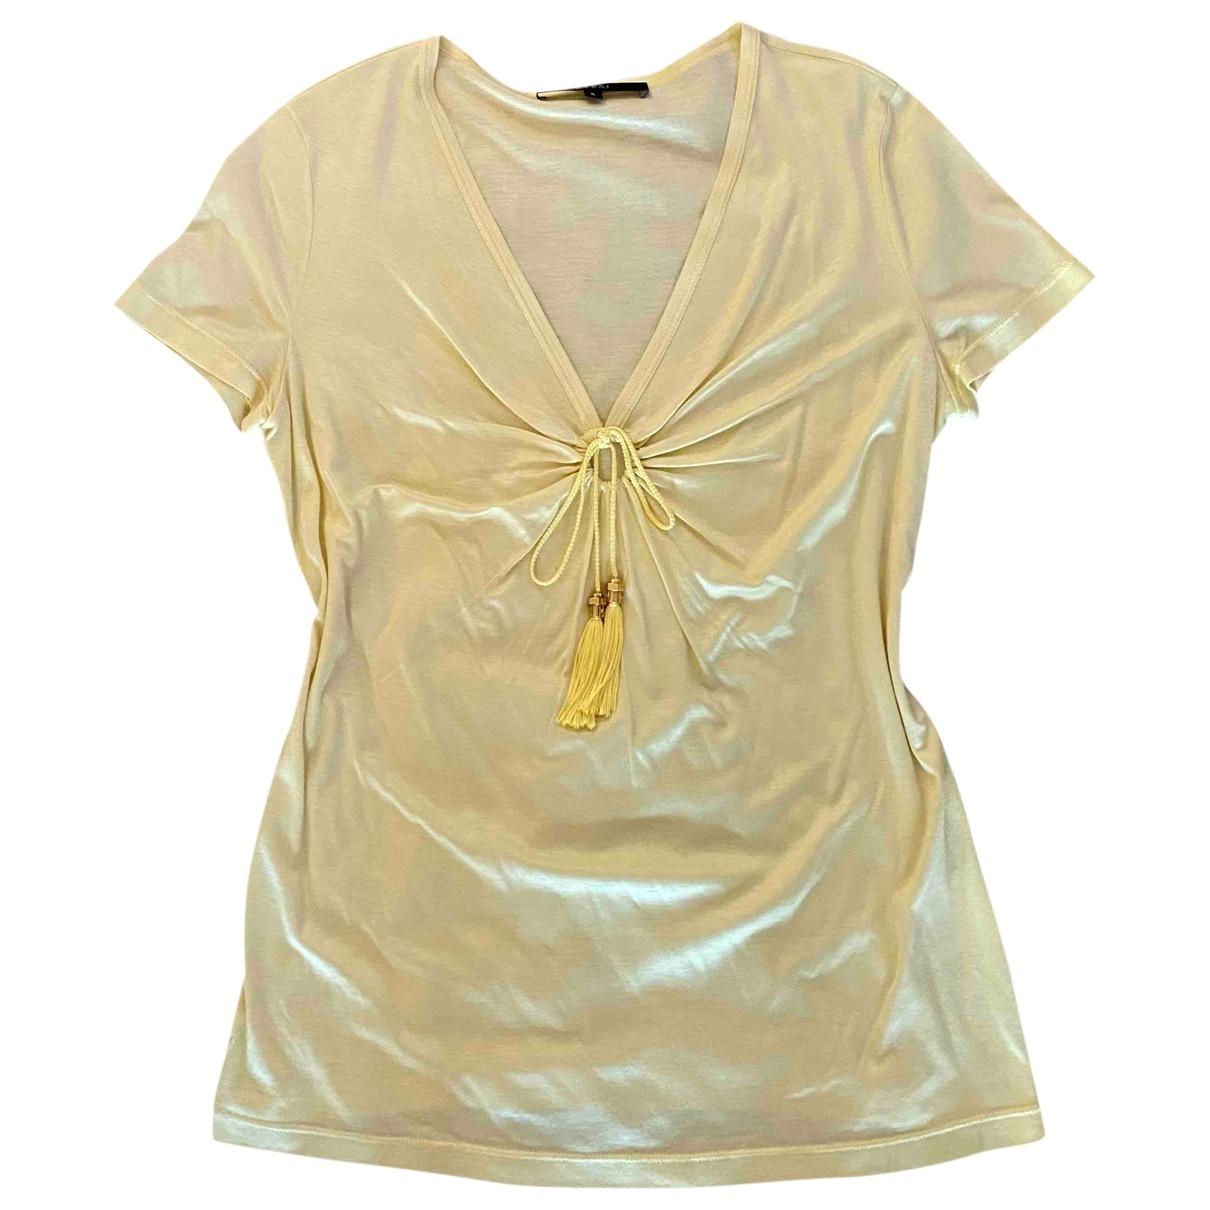 Gucci \N Yellow  top for Women S International